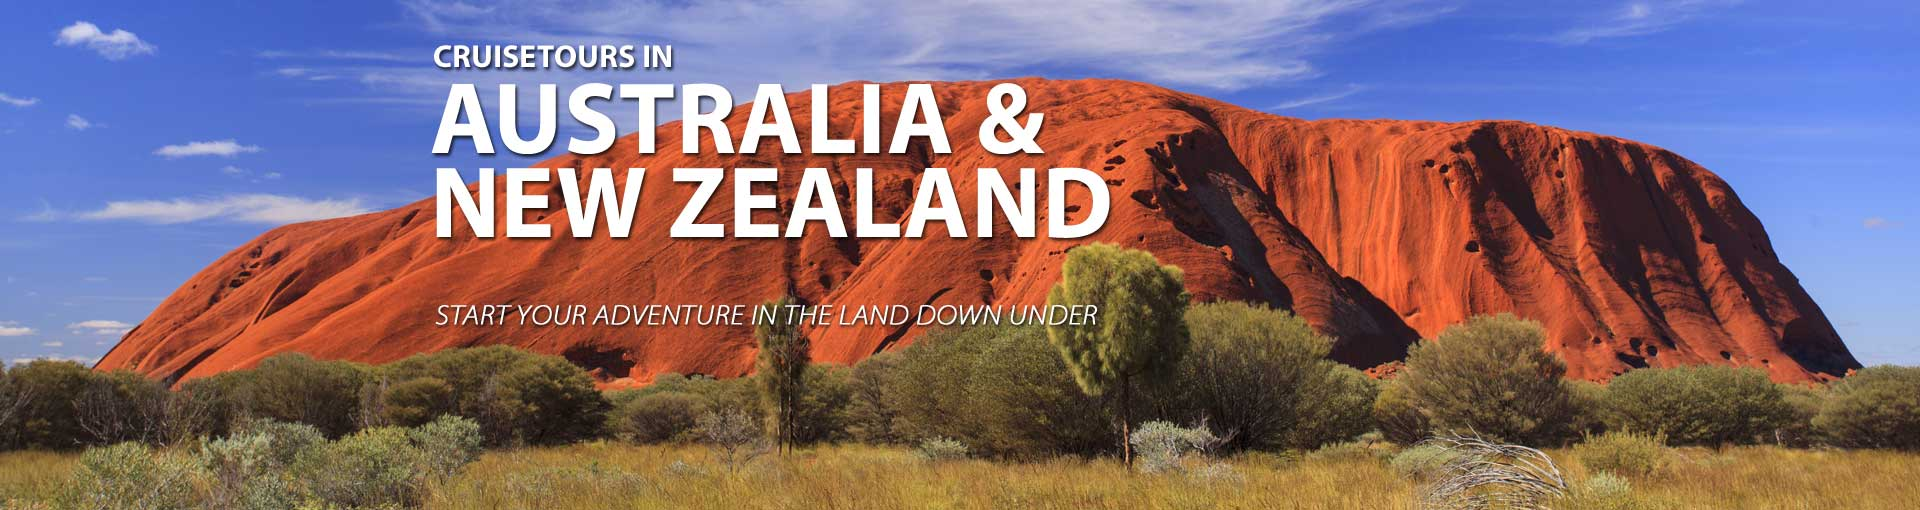 Australia/New Zealand Cruisetours